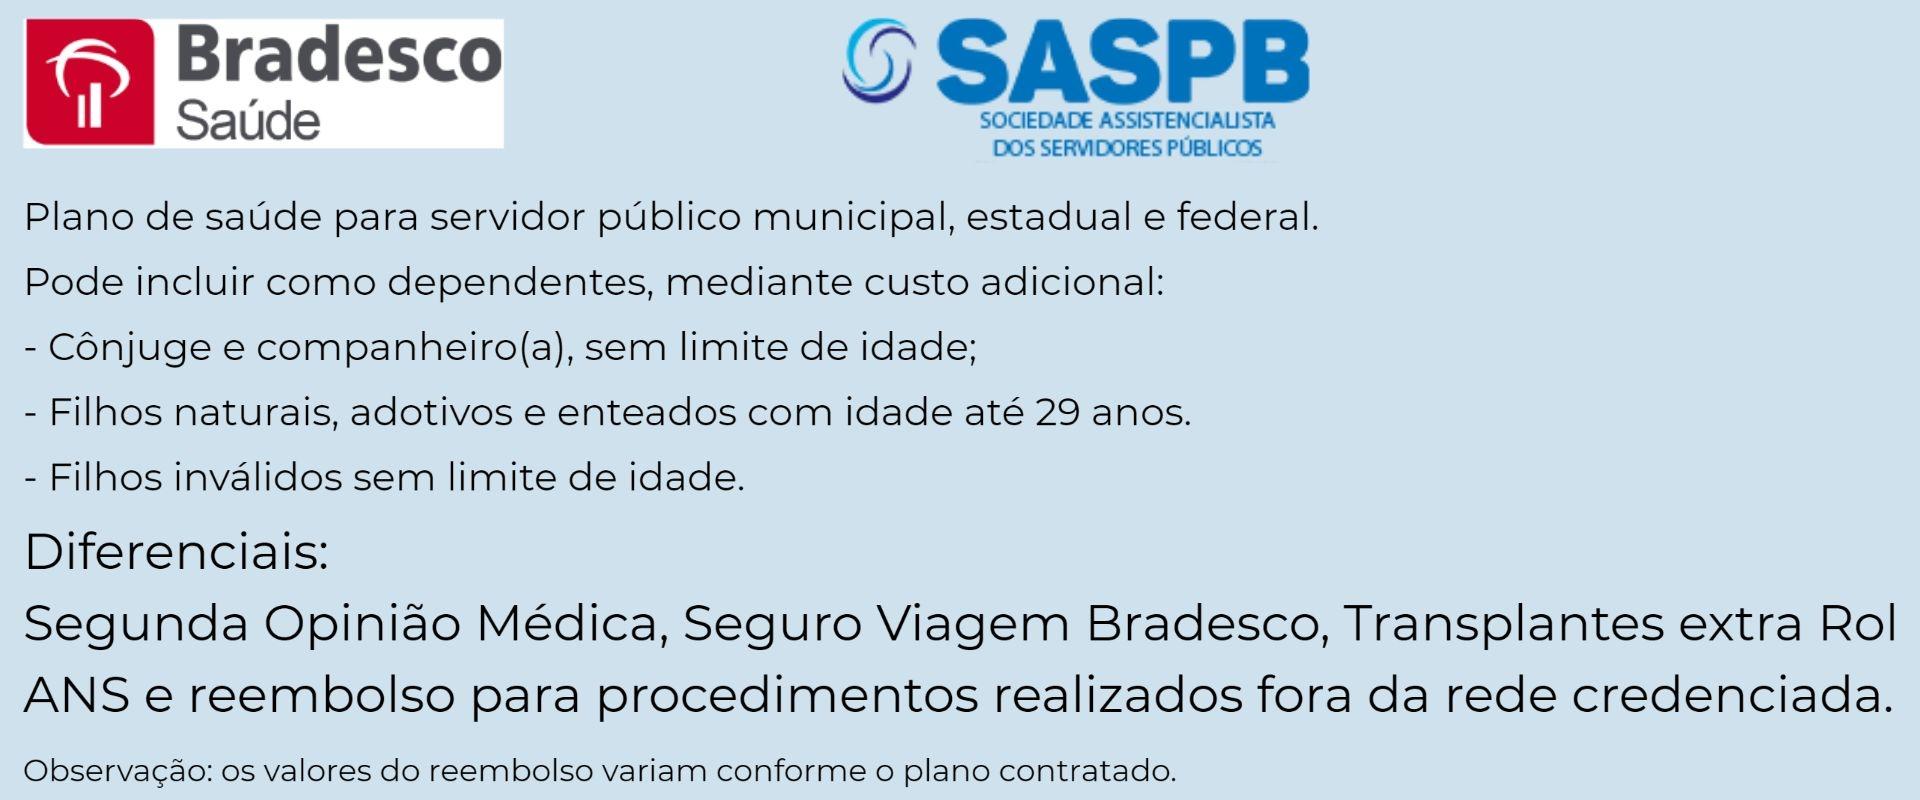 Bradesco Saúde SASPB-AP